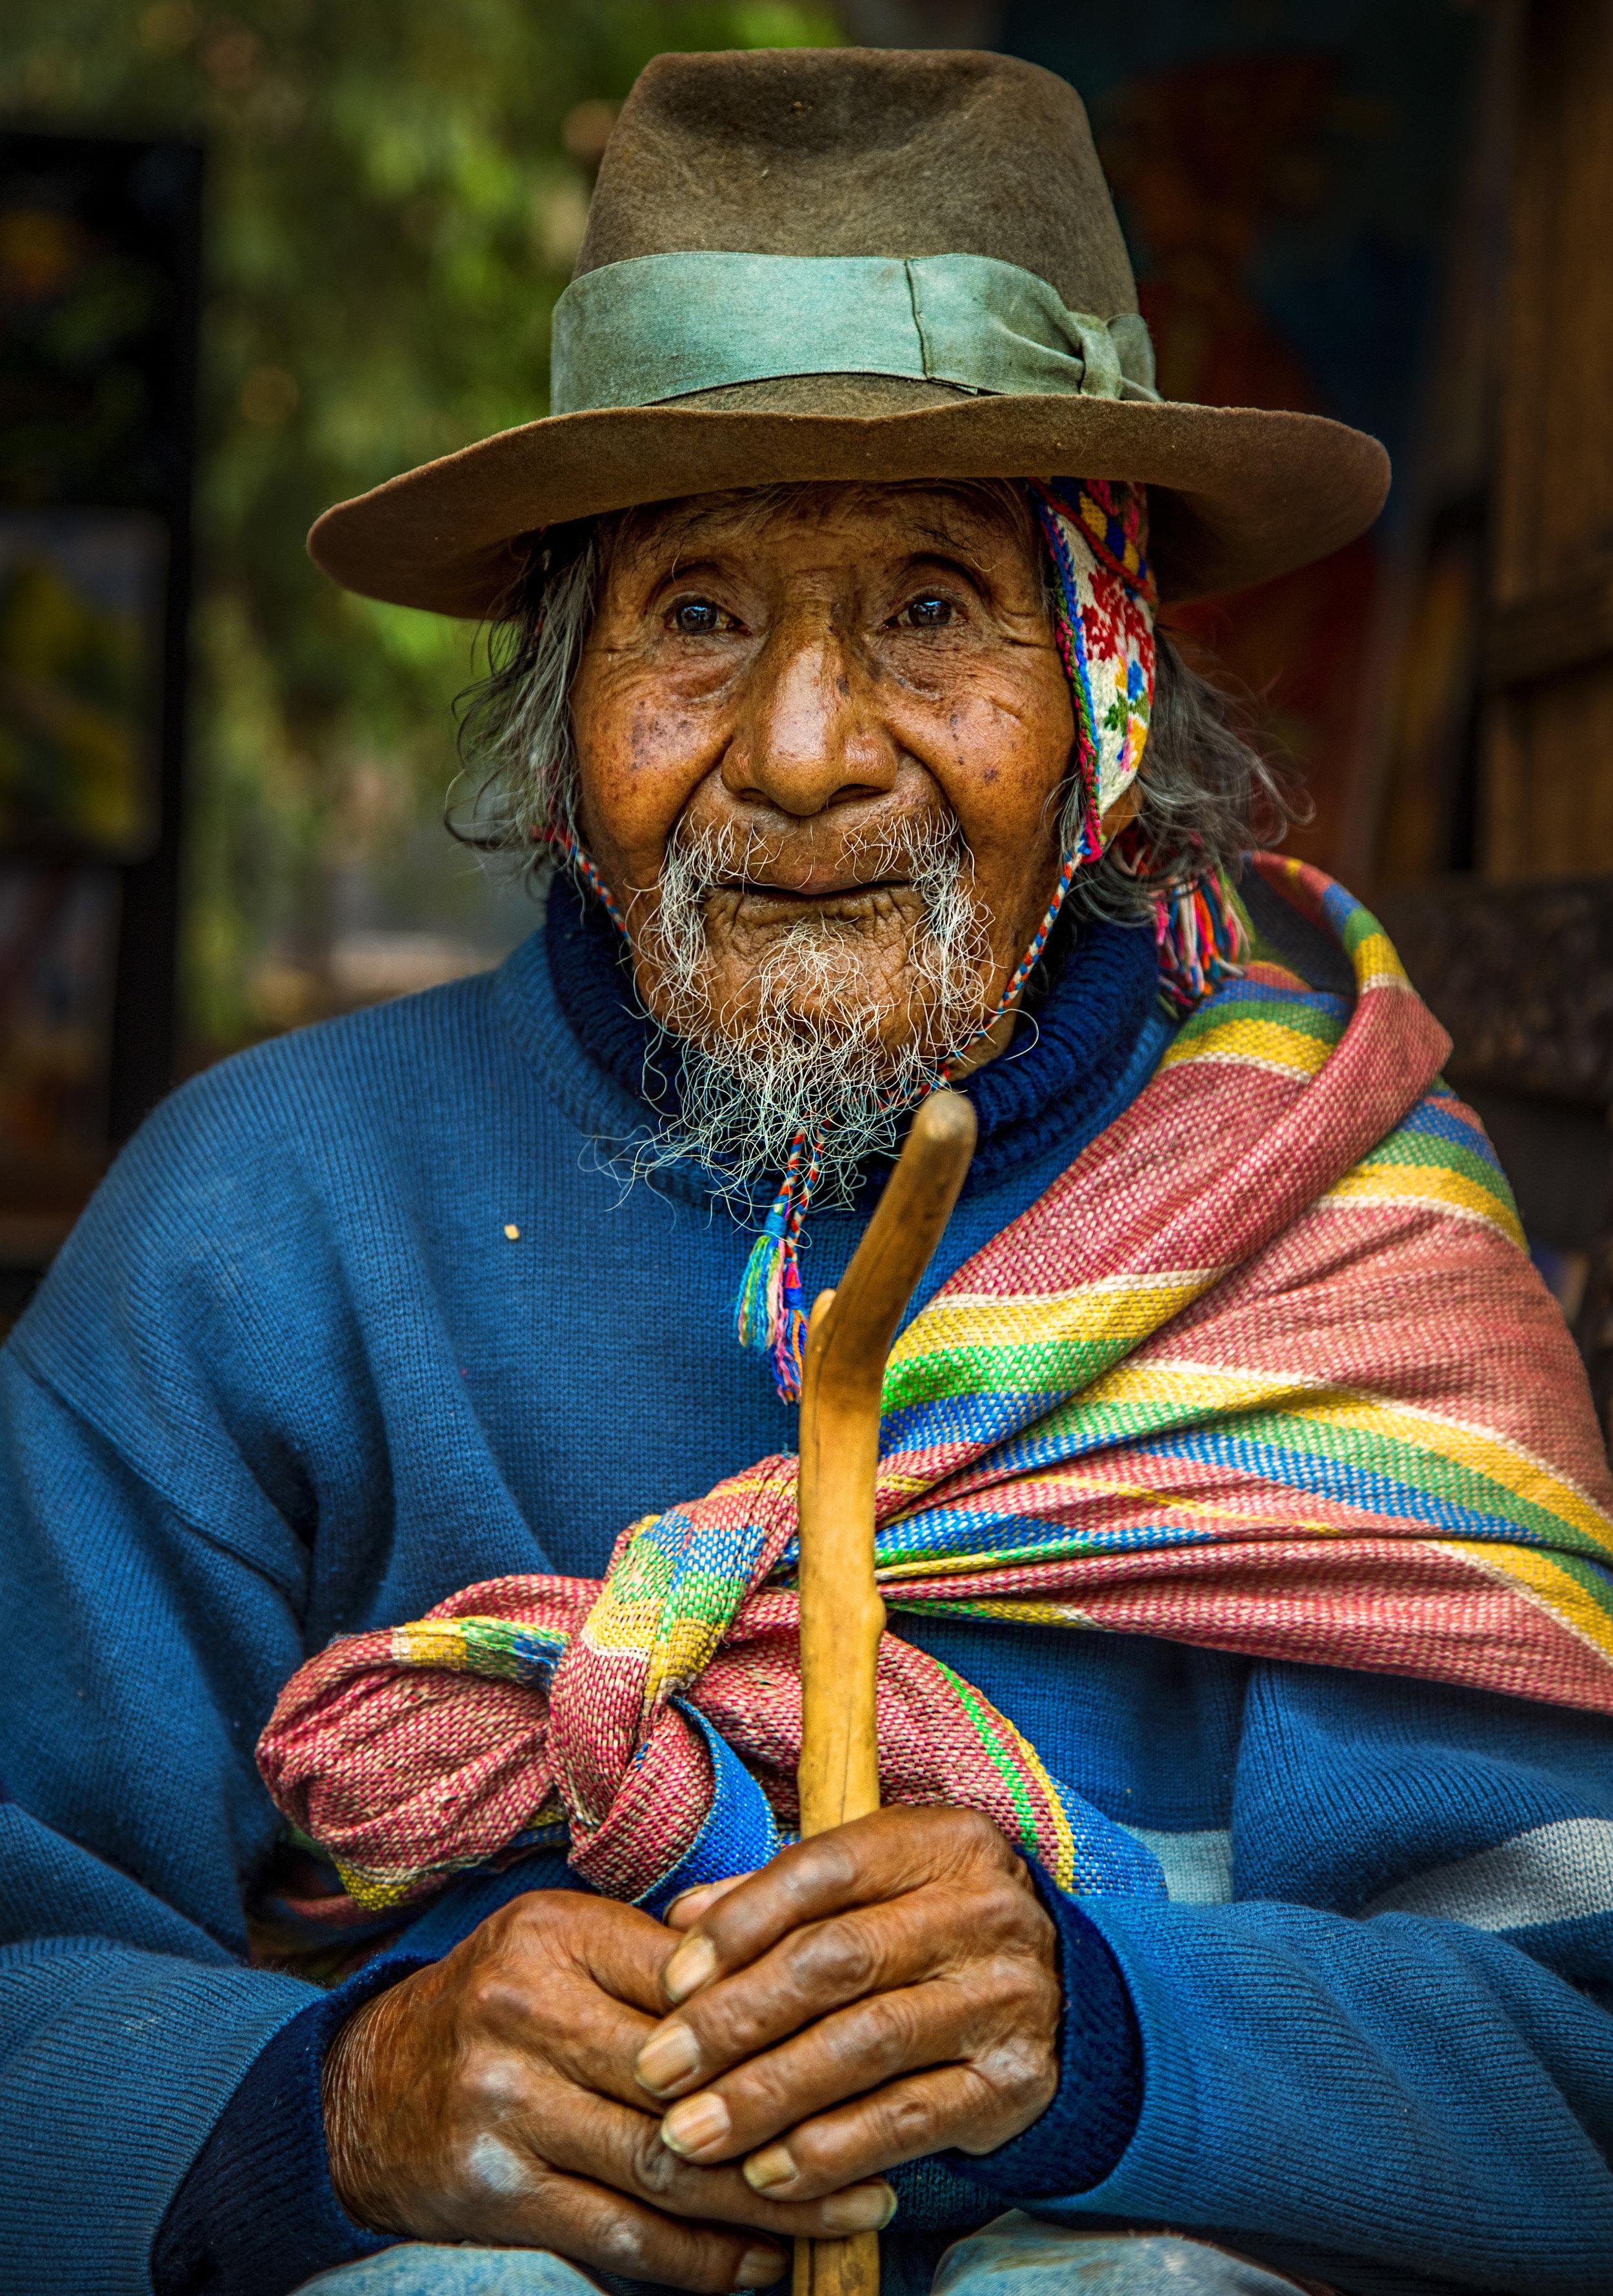 Simon+Needham+Humanitarian+Photography+Peru+3.jpg